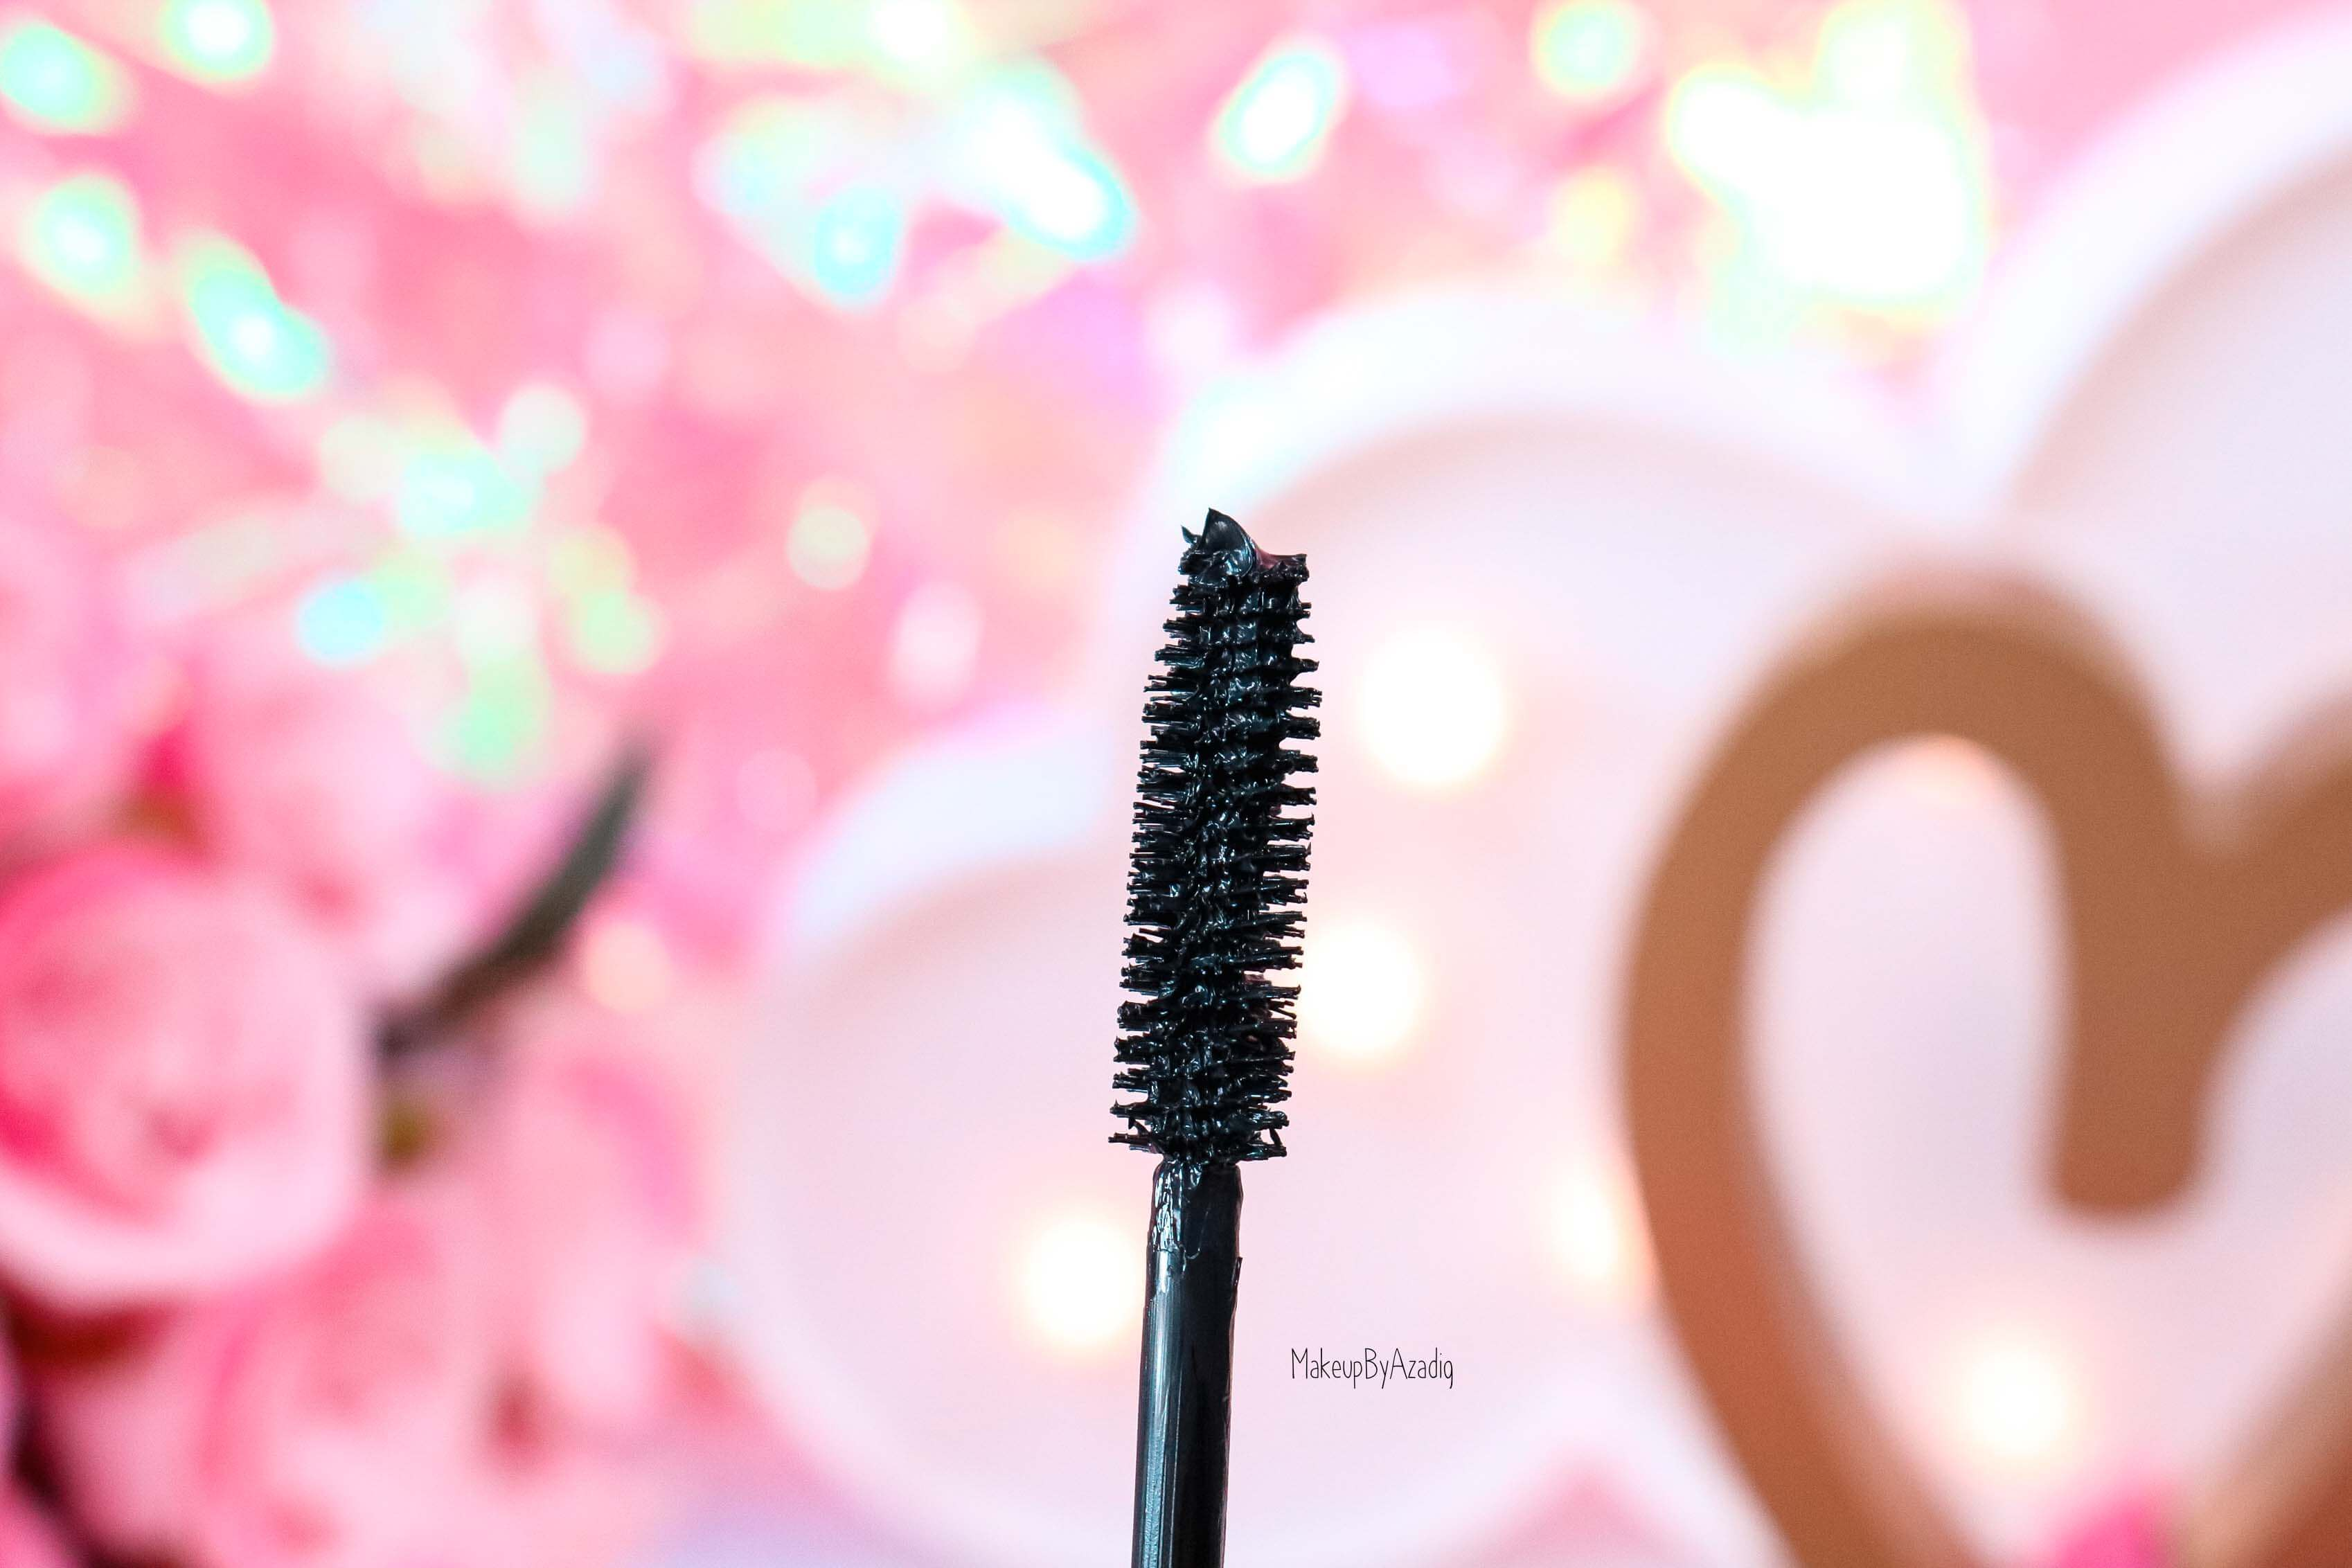 revue-meilleur-mascara-noir-giorgio-armani-eyes-to-kill-classico-volume-longueur-avis-prix-sephora-makeupbyazadig-brosse